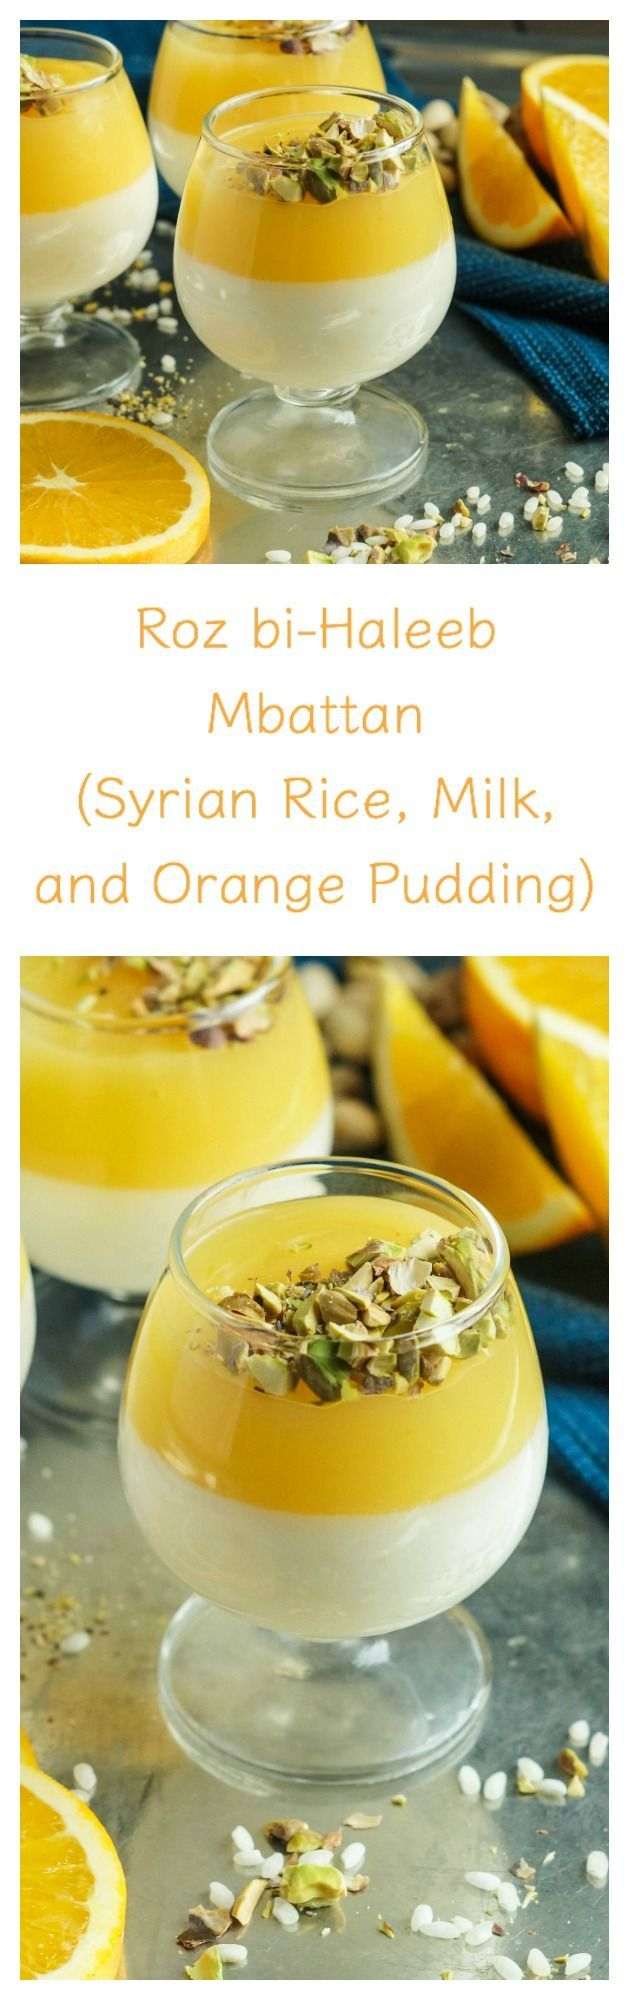 Roz bi-Haleeb Mbattan (Syrian Rice, Milk, and Orange Pudding)  #rice #pudding #dessert #citrus #orange